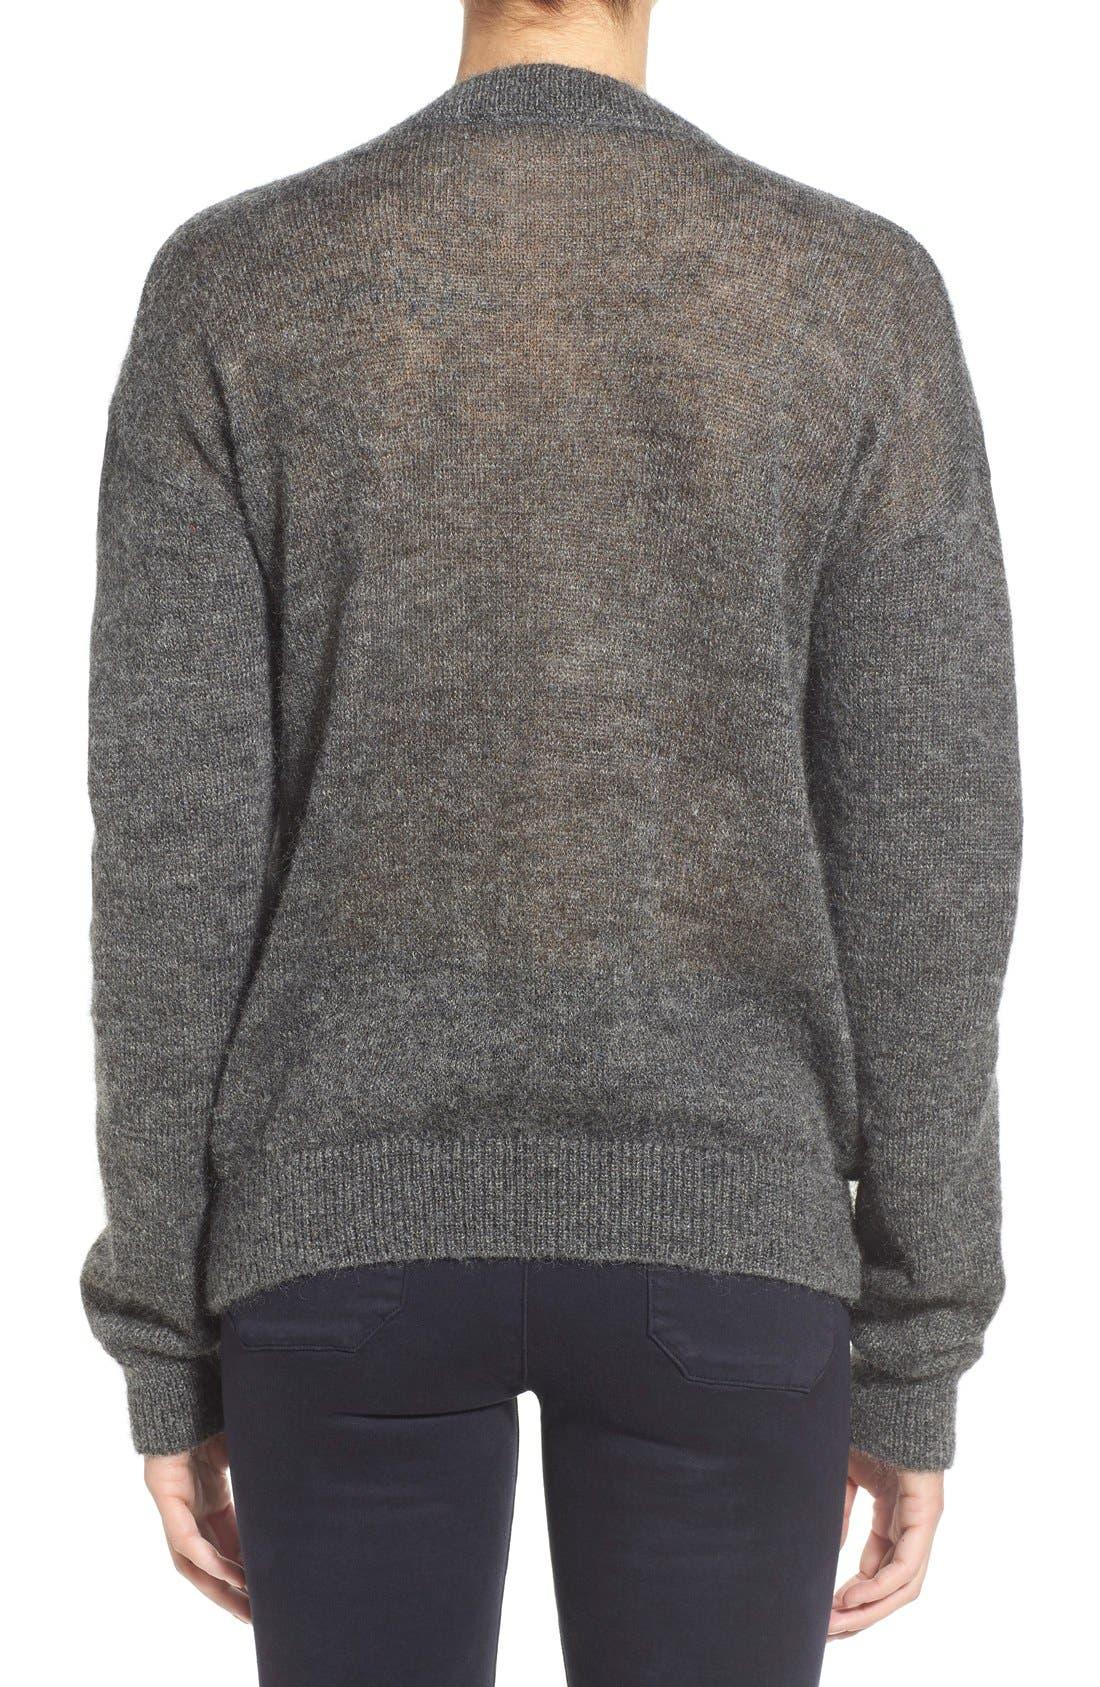 Alternate Image 2  - M.i.h. Jeans 'Delo' Mohair Blend Crewneck Sweater